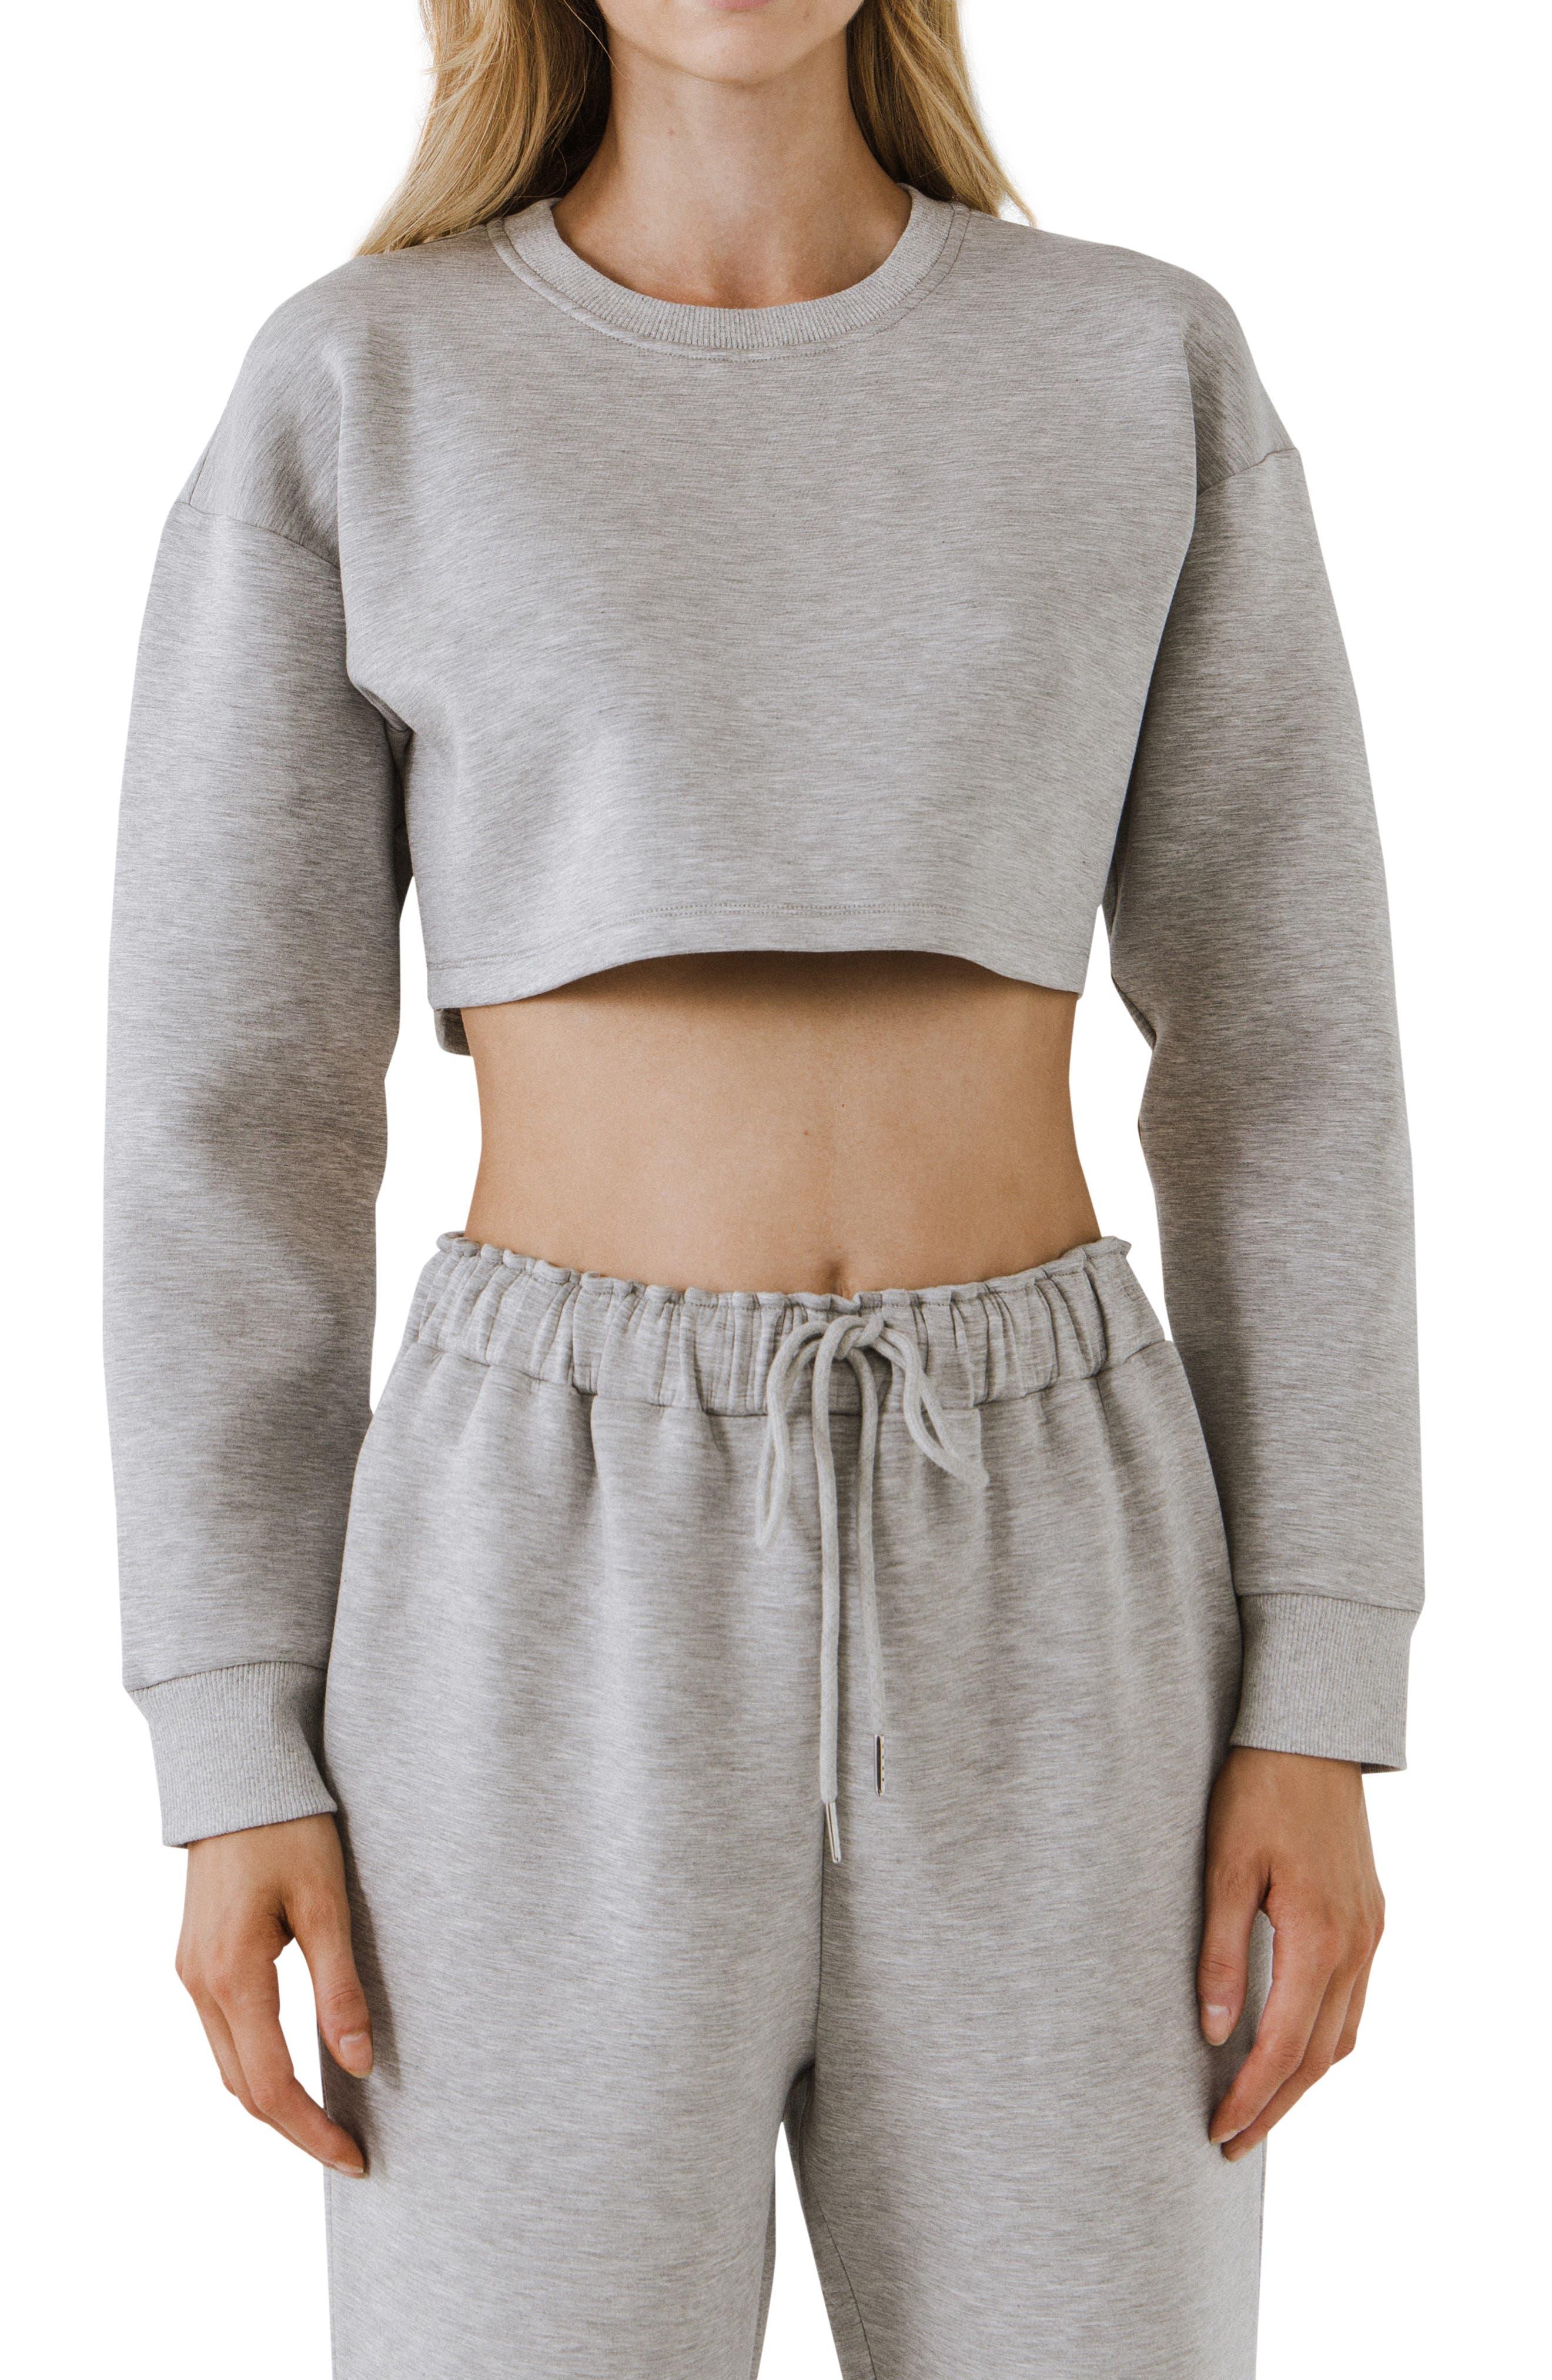 Lounge Wear Crop Crewneck Sweatshirt